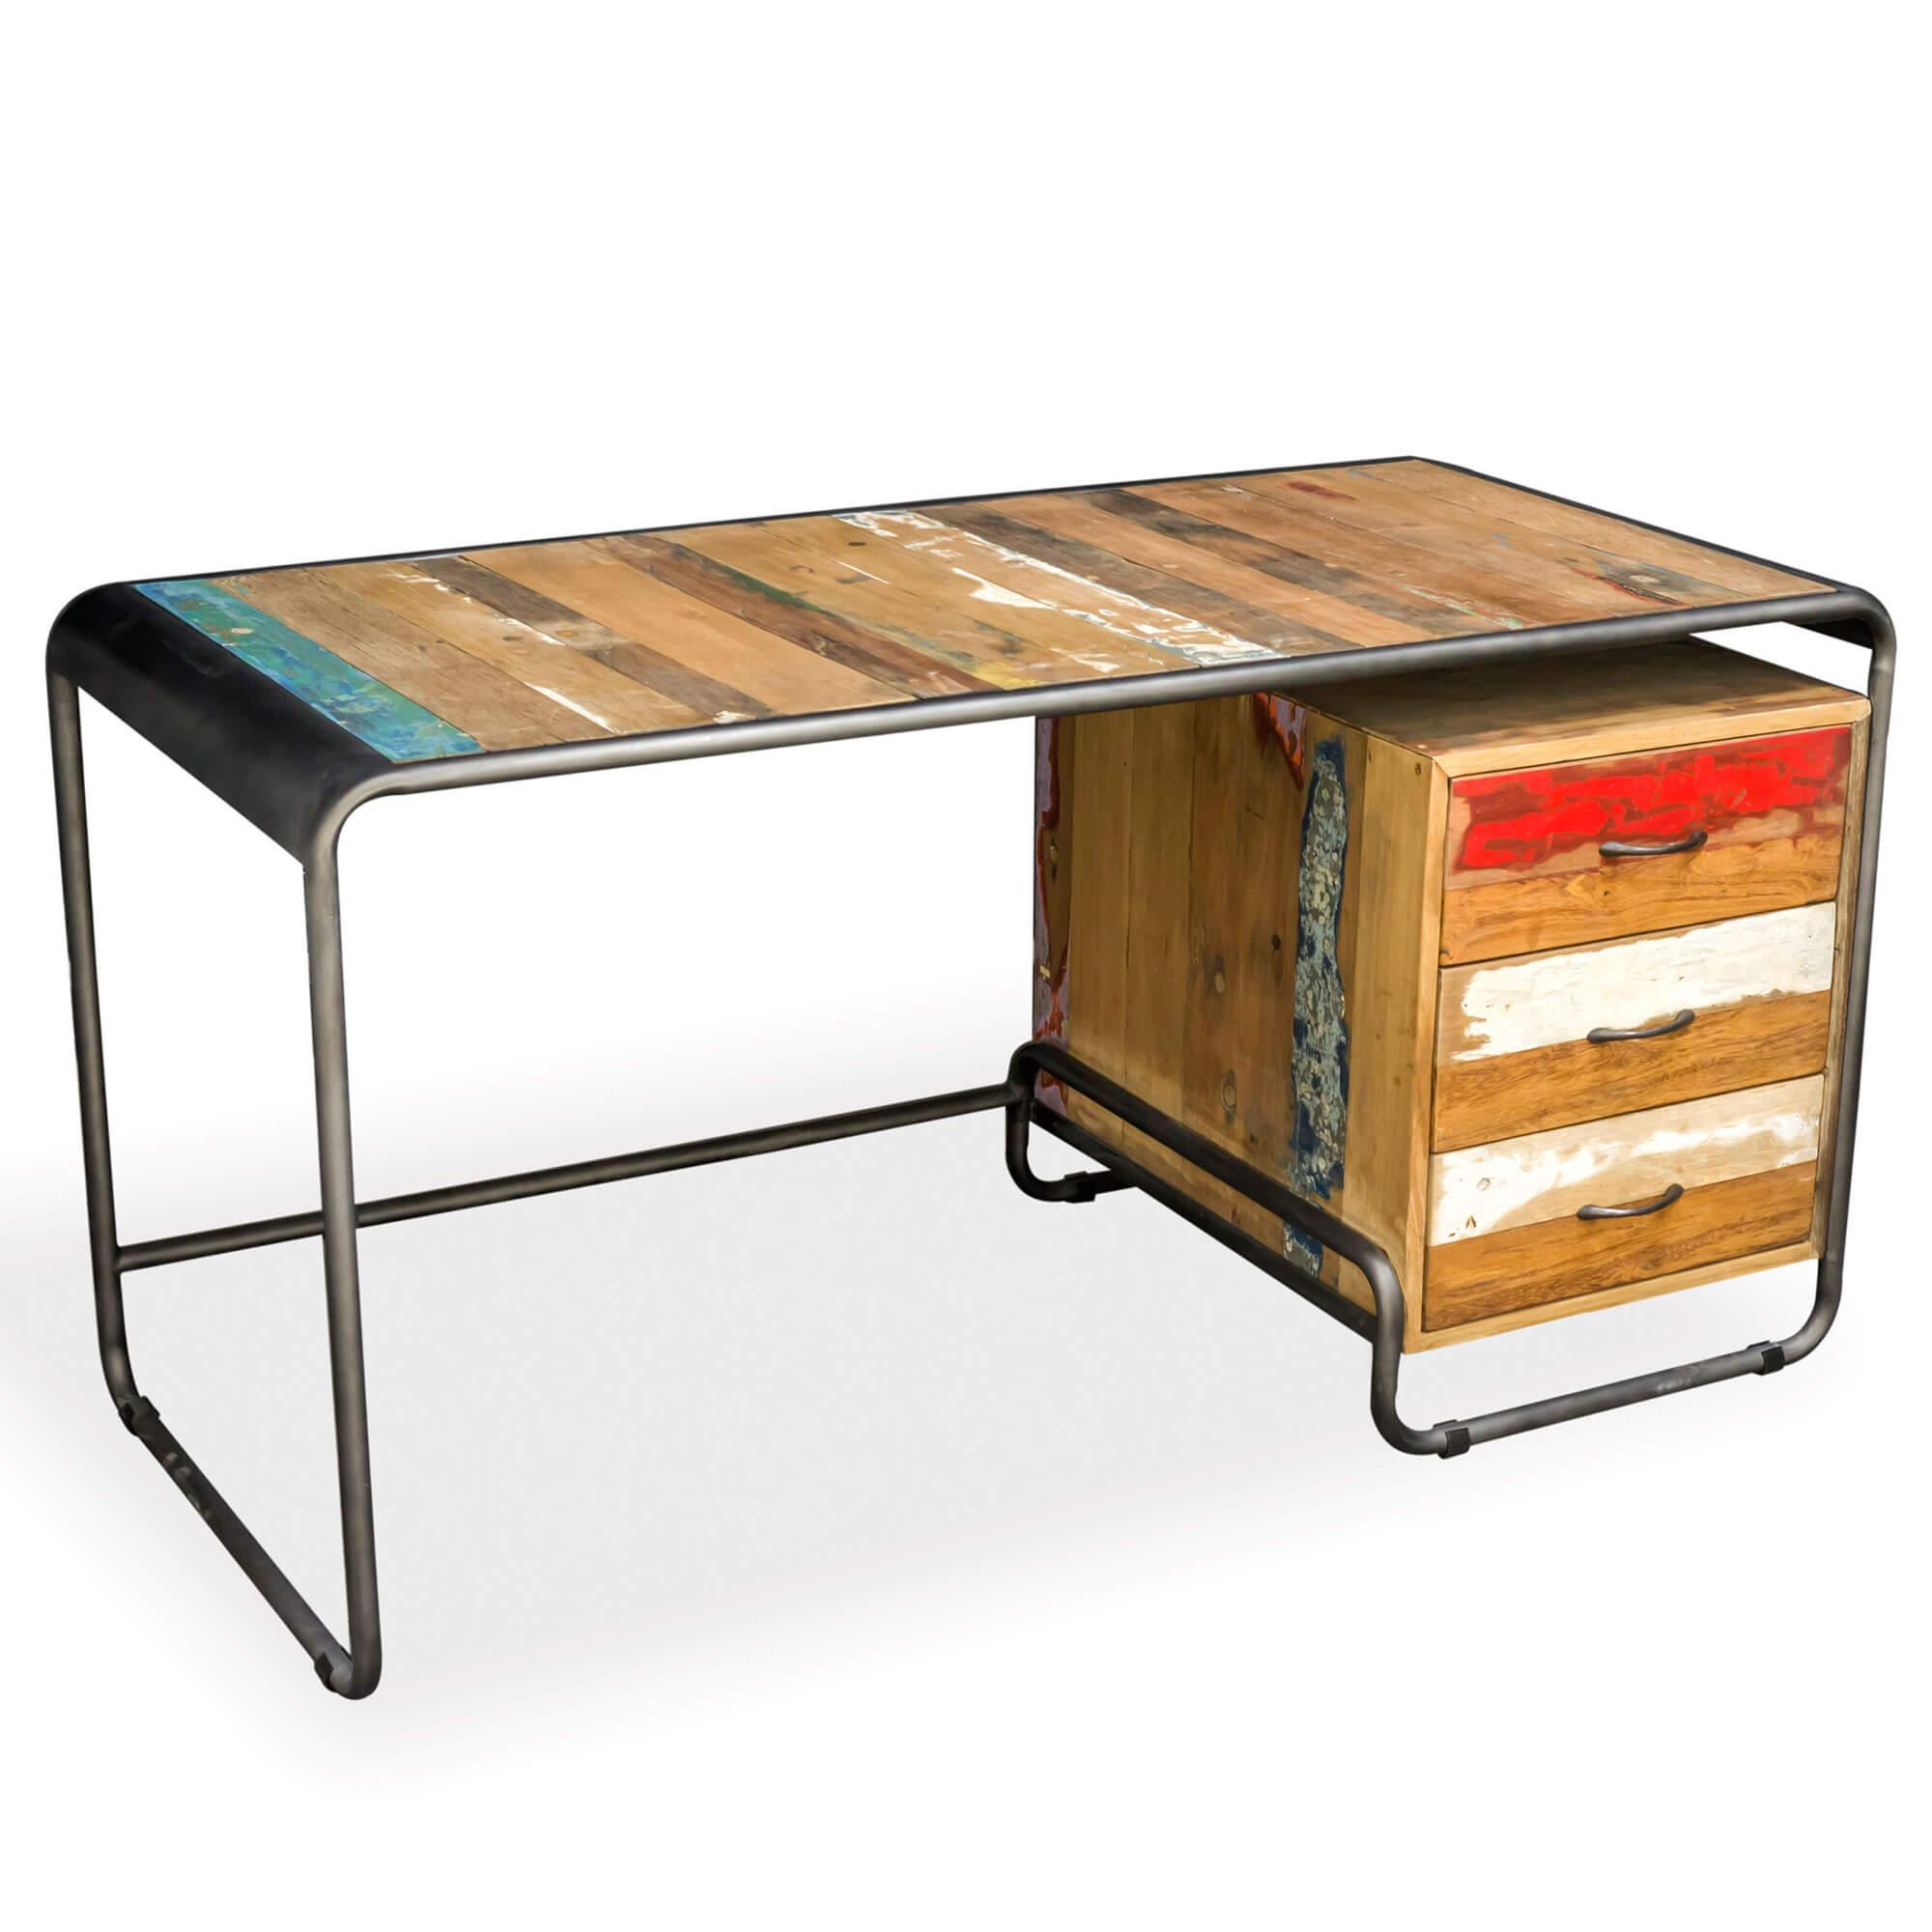 Mango Wood|Reclaimed Wood | Desk | FSUK-BBTIC32